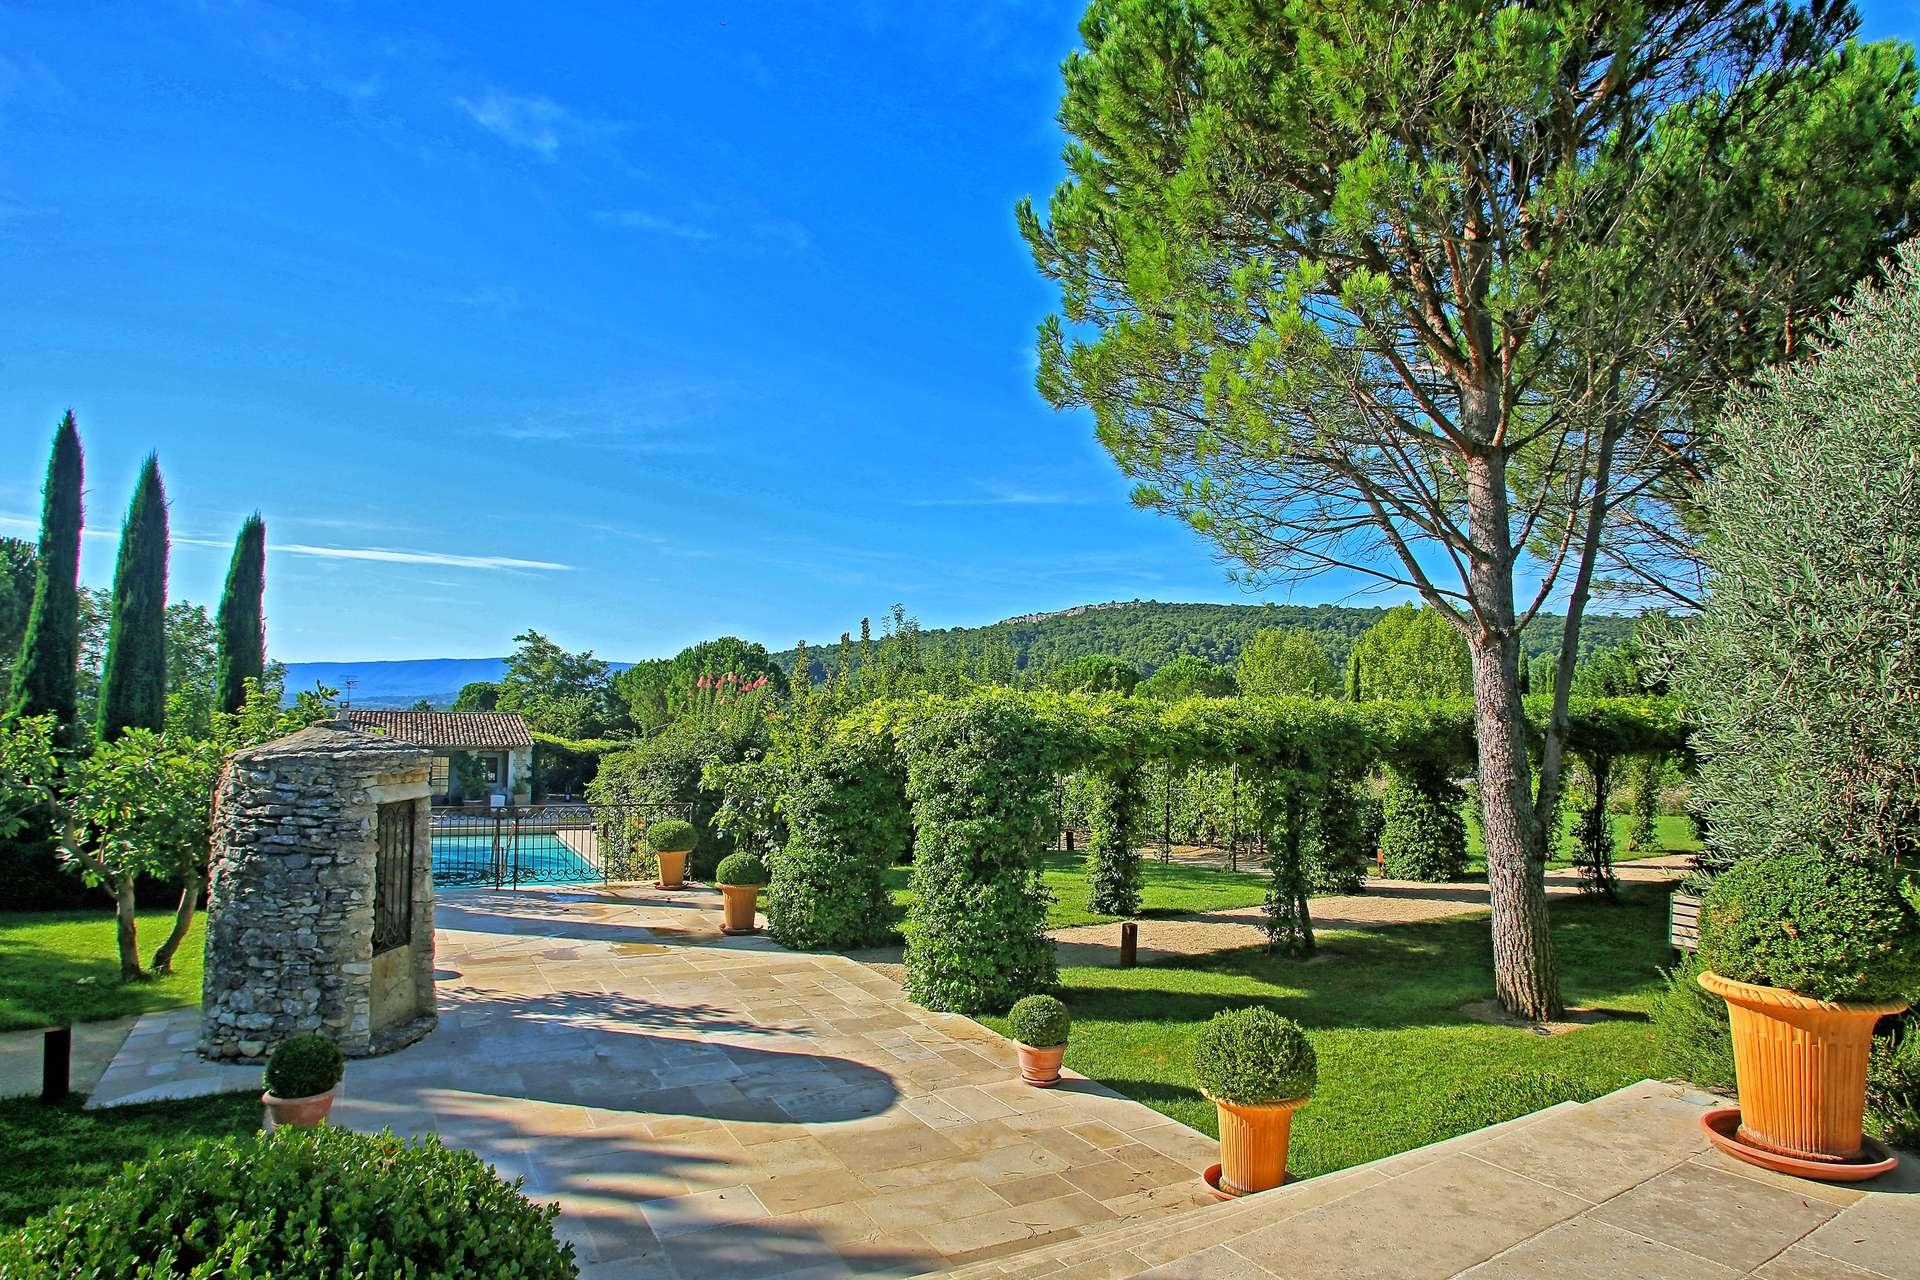 Luxury vacation rentals europe - France - Provence ih - Provence luberon - Ulysse - Image 1/20